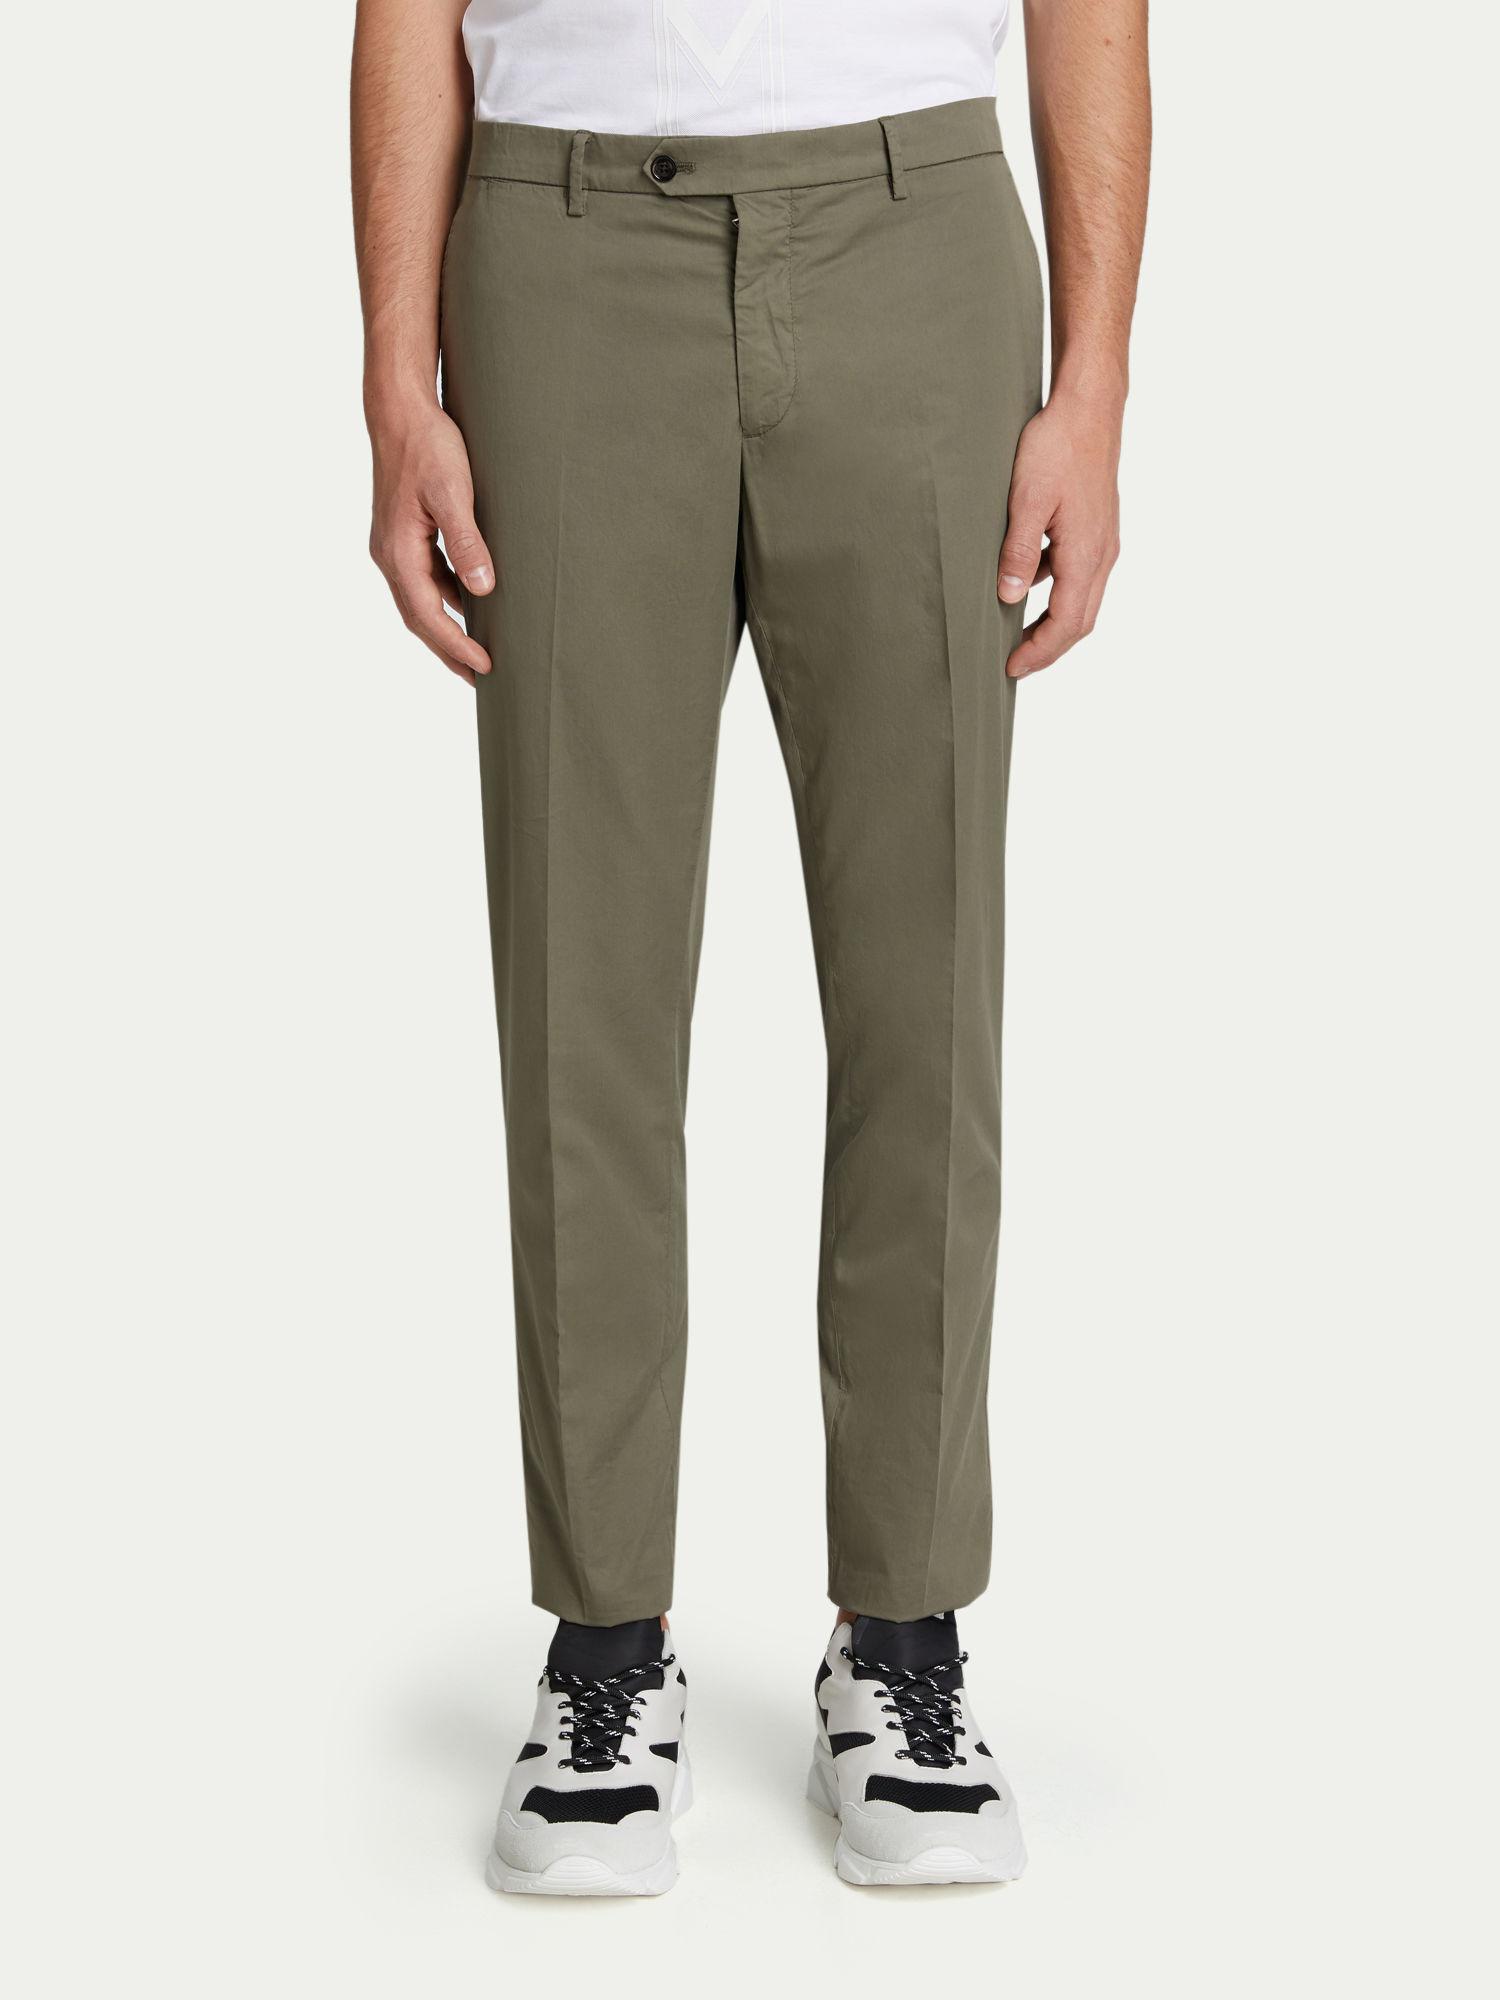 Pantalone Uomo Uomo Pantalone Tasche Filetti Uomo Filetti Tasche Tasche Filetti Tasche Pantalone Filetti vYIy7mbf6g